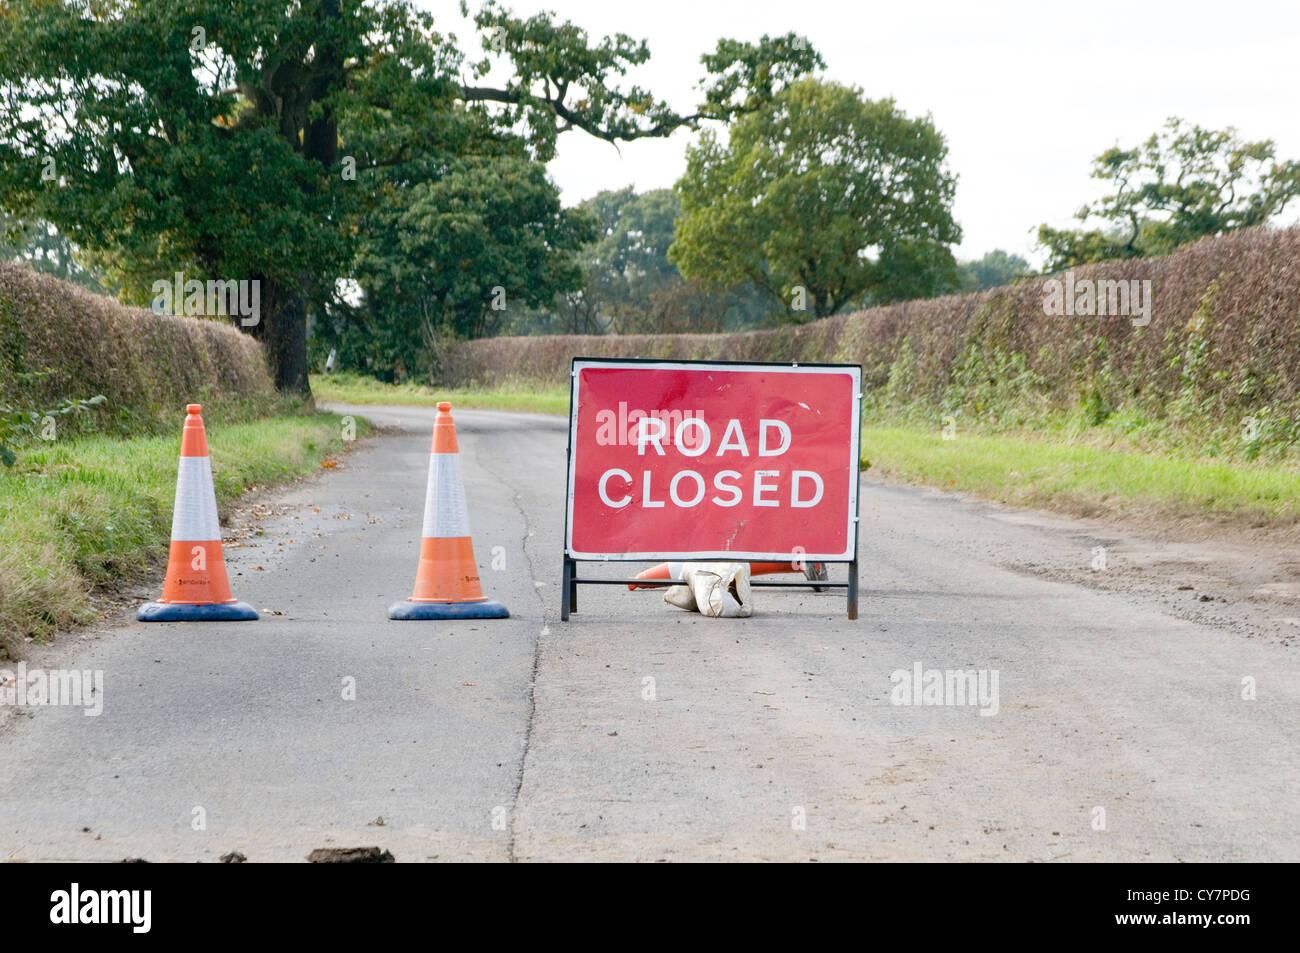 Straße gesperrt Schild Roadsign Verkehrszeichen Shut Stockbild